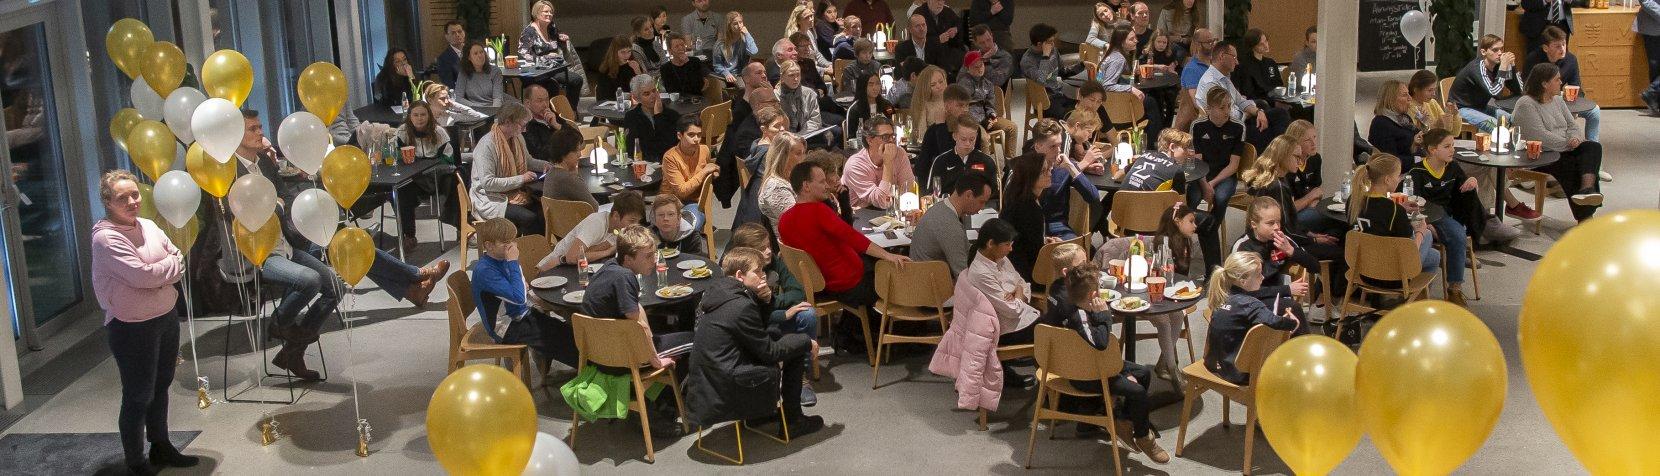 Idrætsgalla i Kulturcafeen 2019